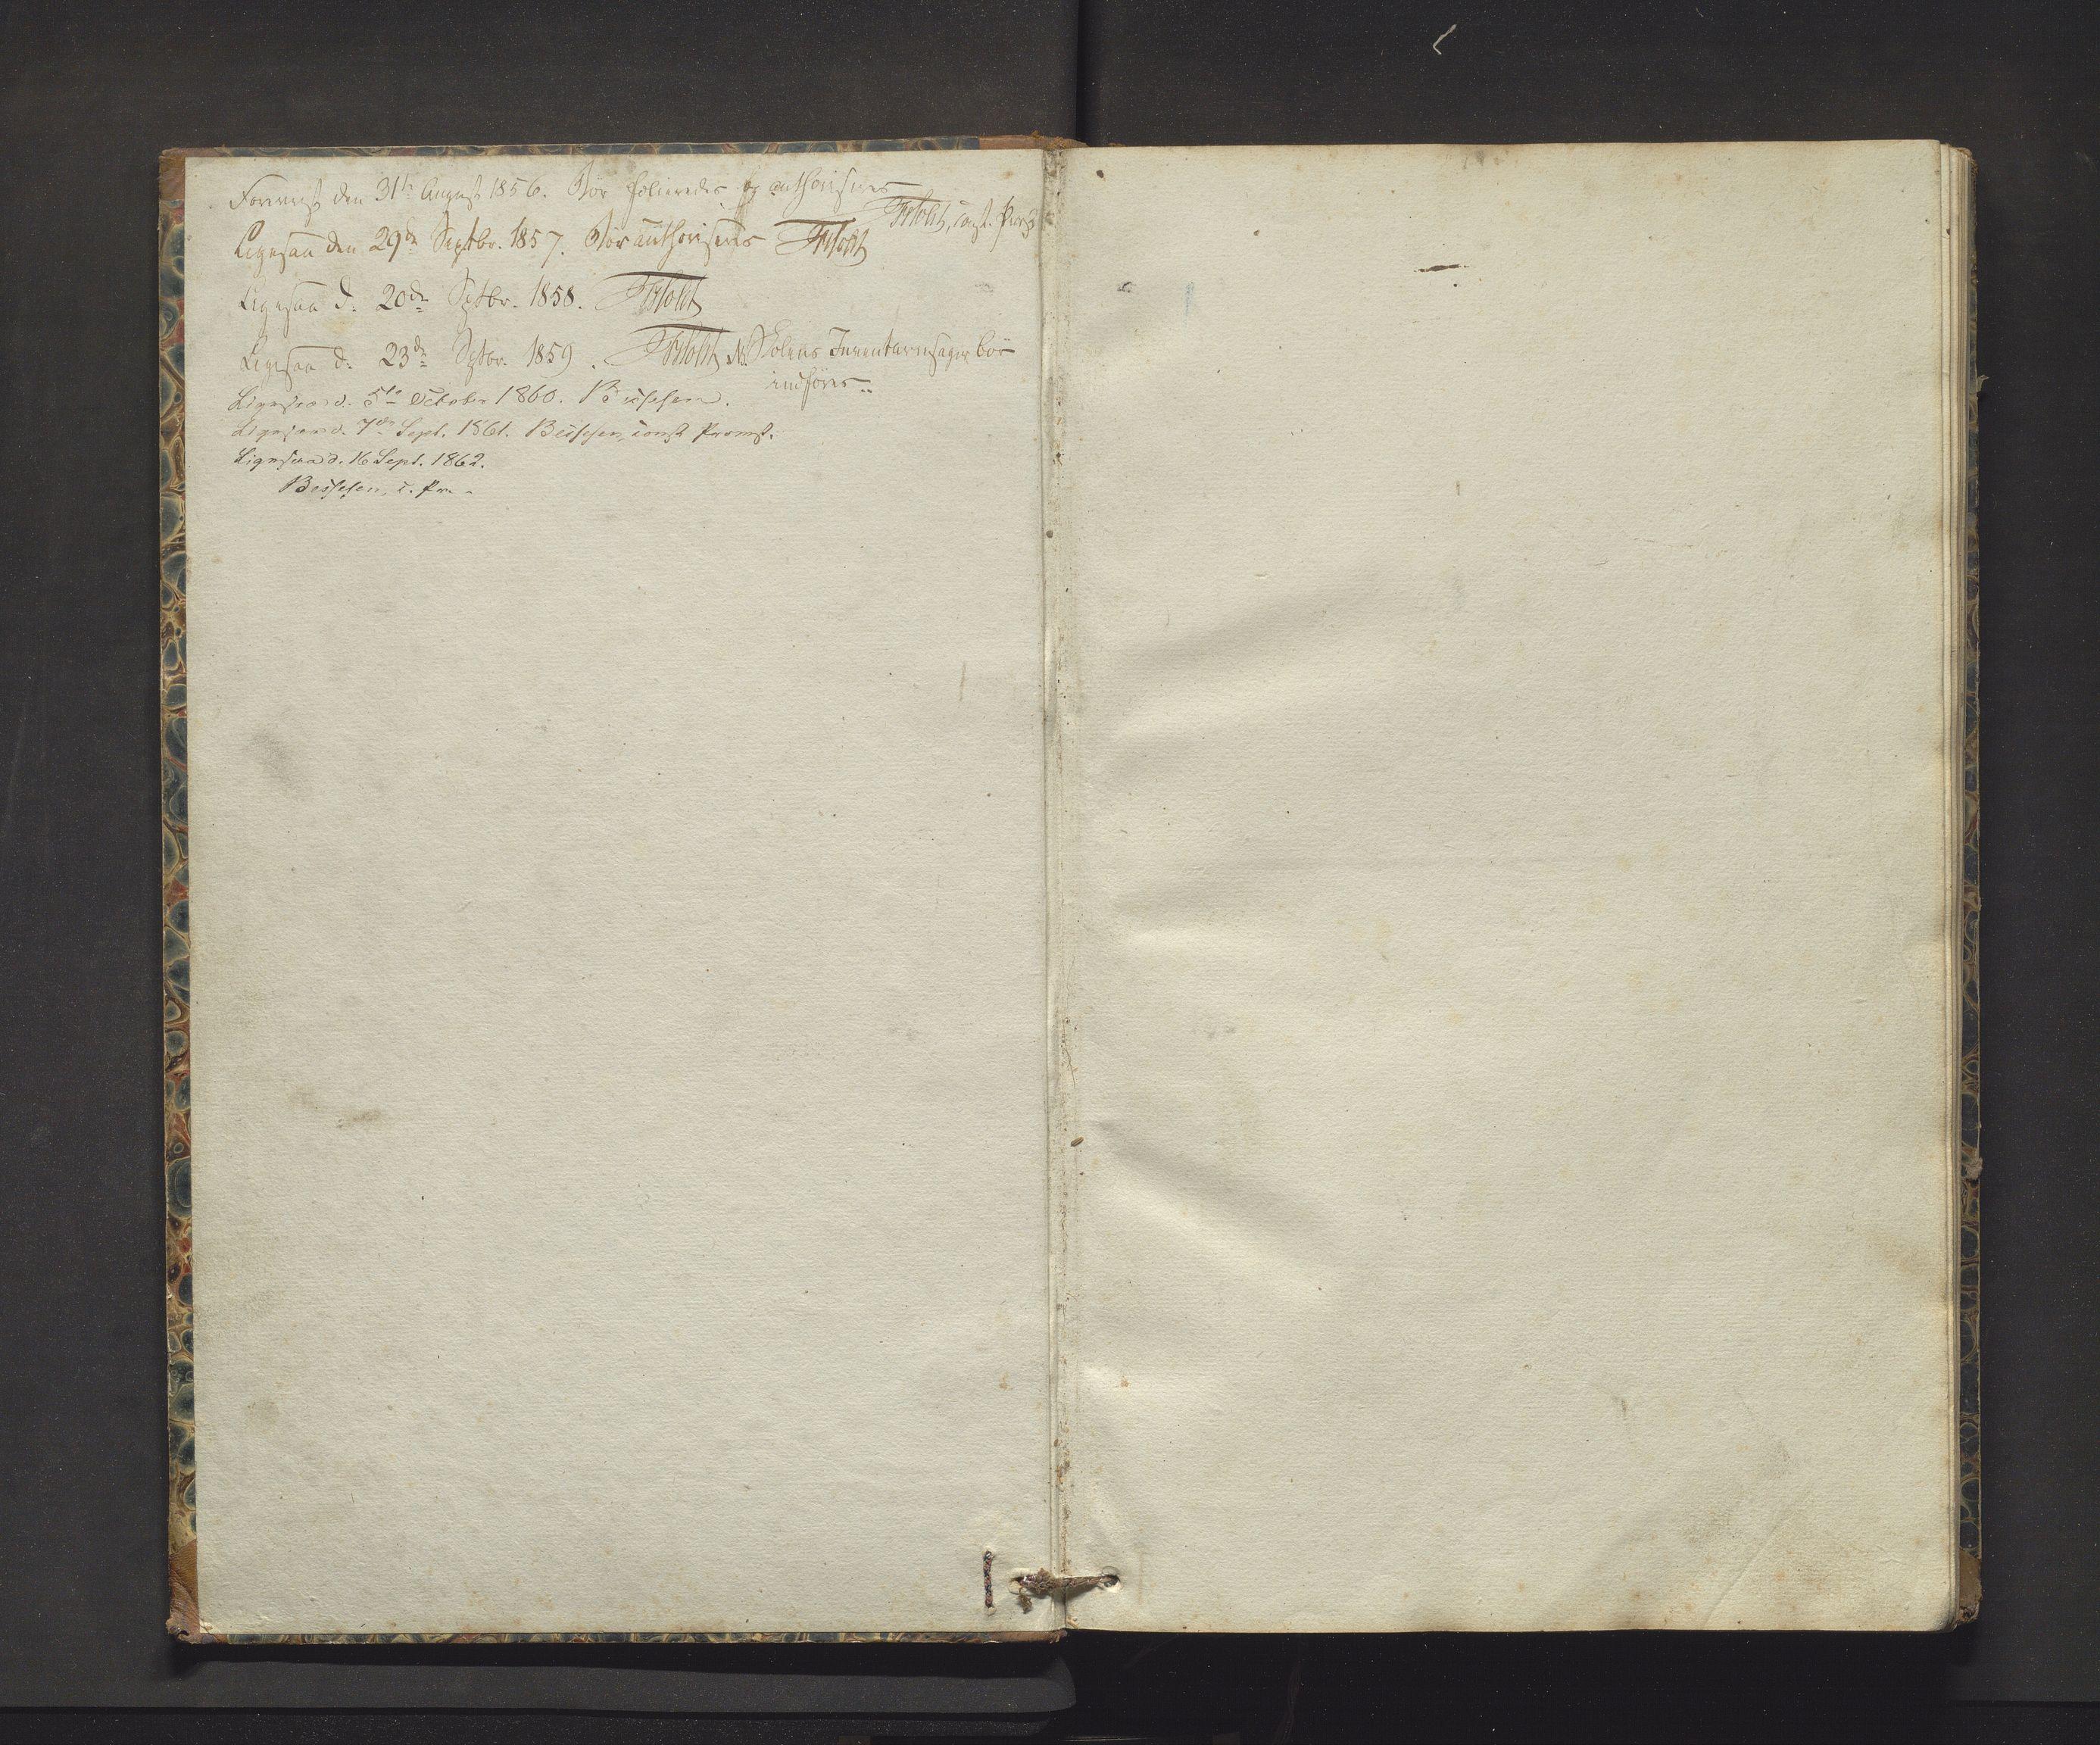 IKAH, Fjelberg kommune. Barneskulane, F/Fb/L0002: Skuleprotokoll for vestre distrikt i Eid sokn, 1855-1863